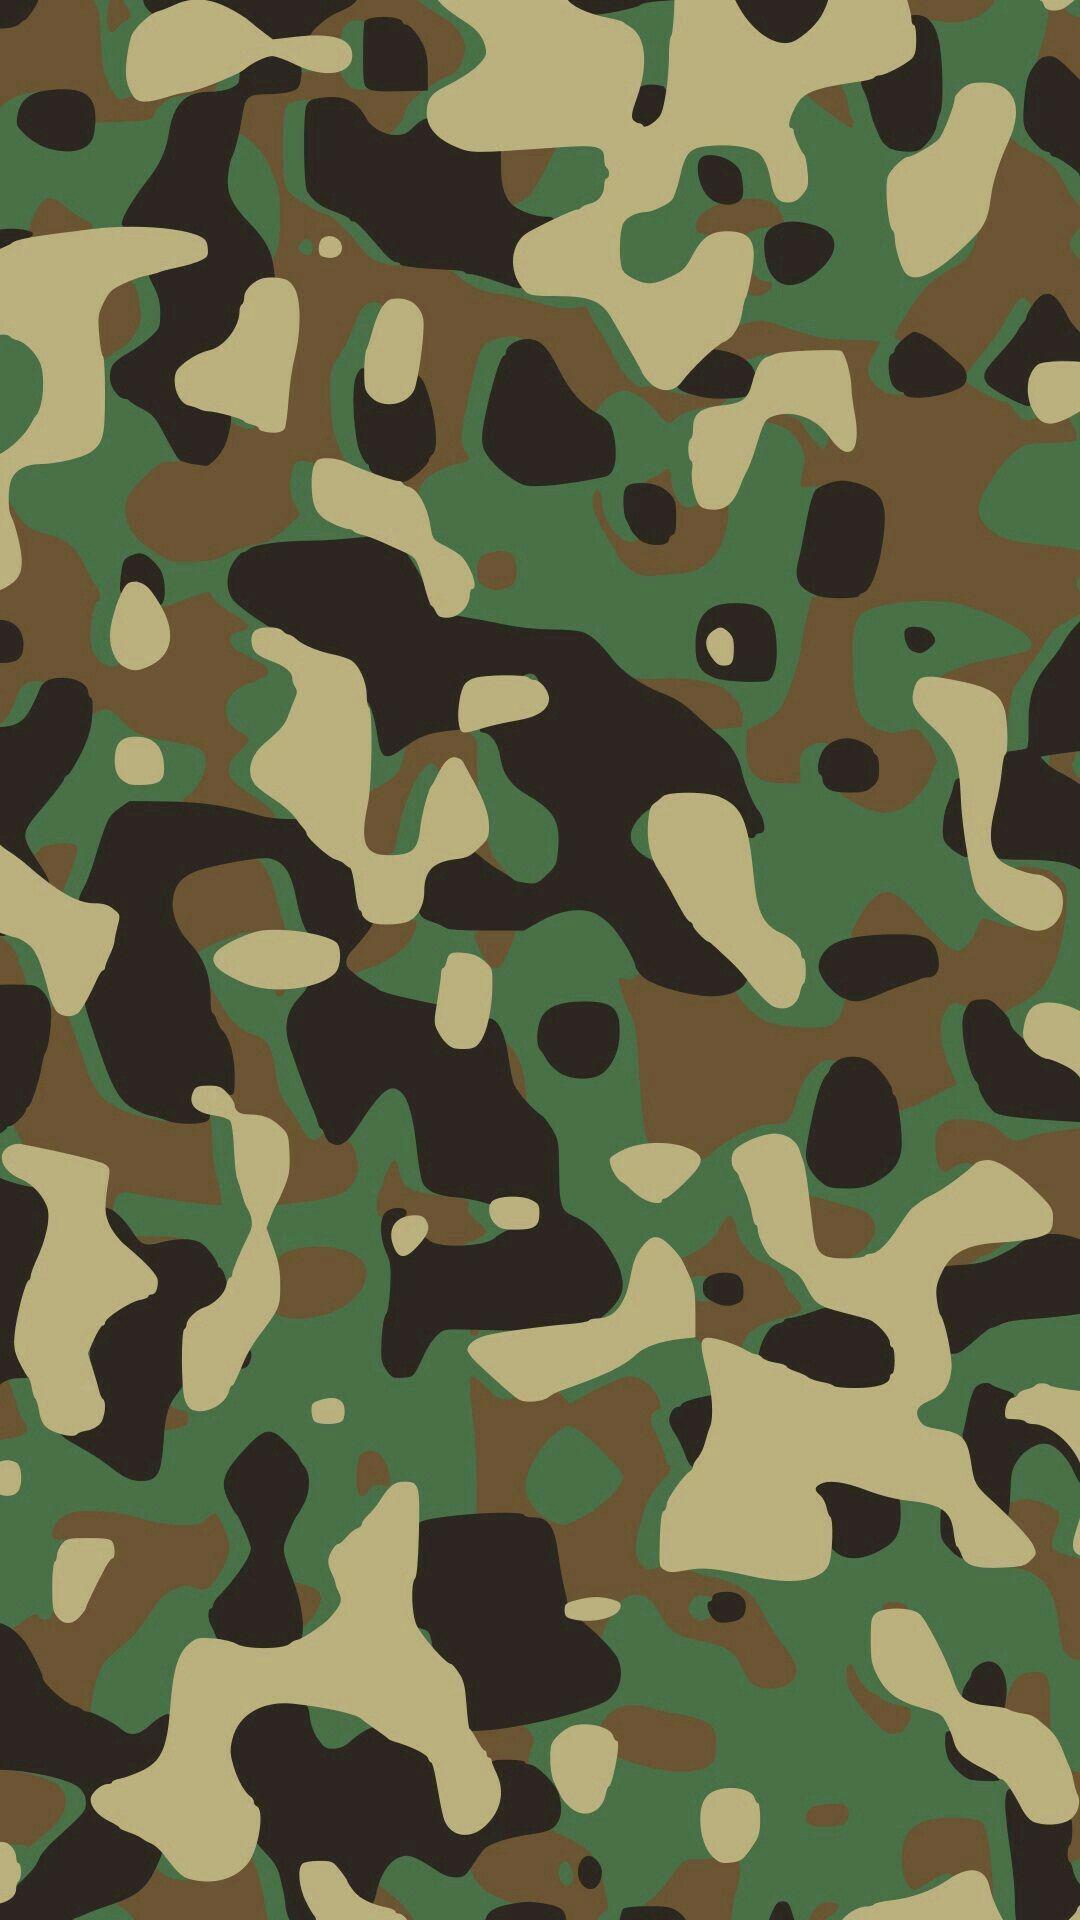 Pin de Mayuran Mayu en Camouflage Fondos militares